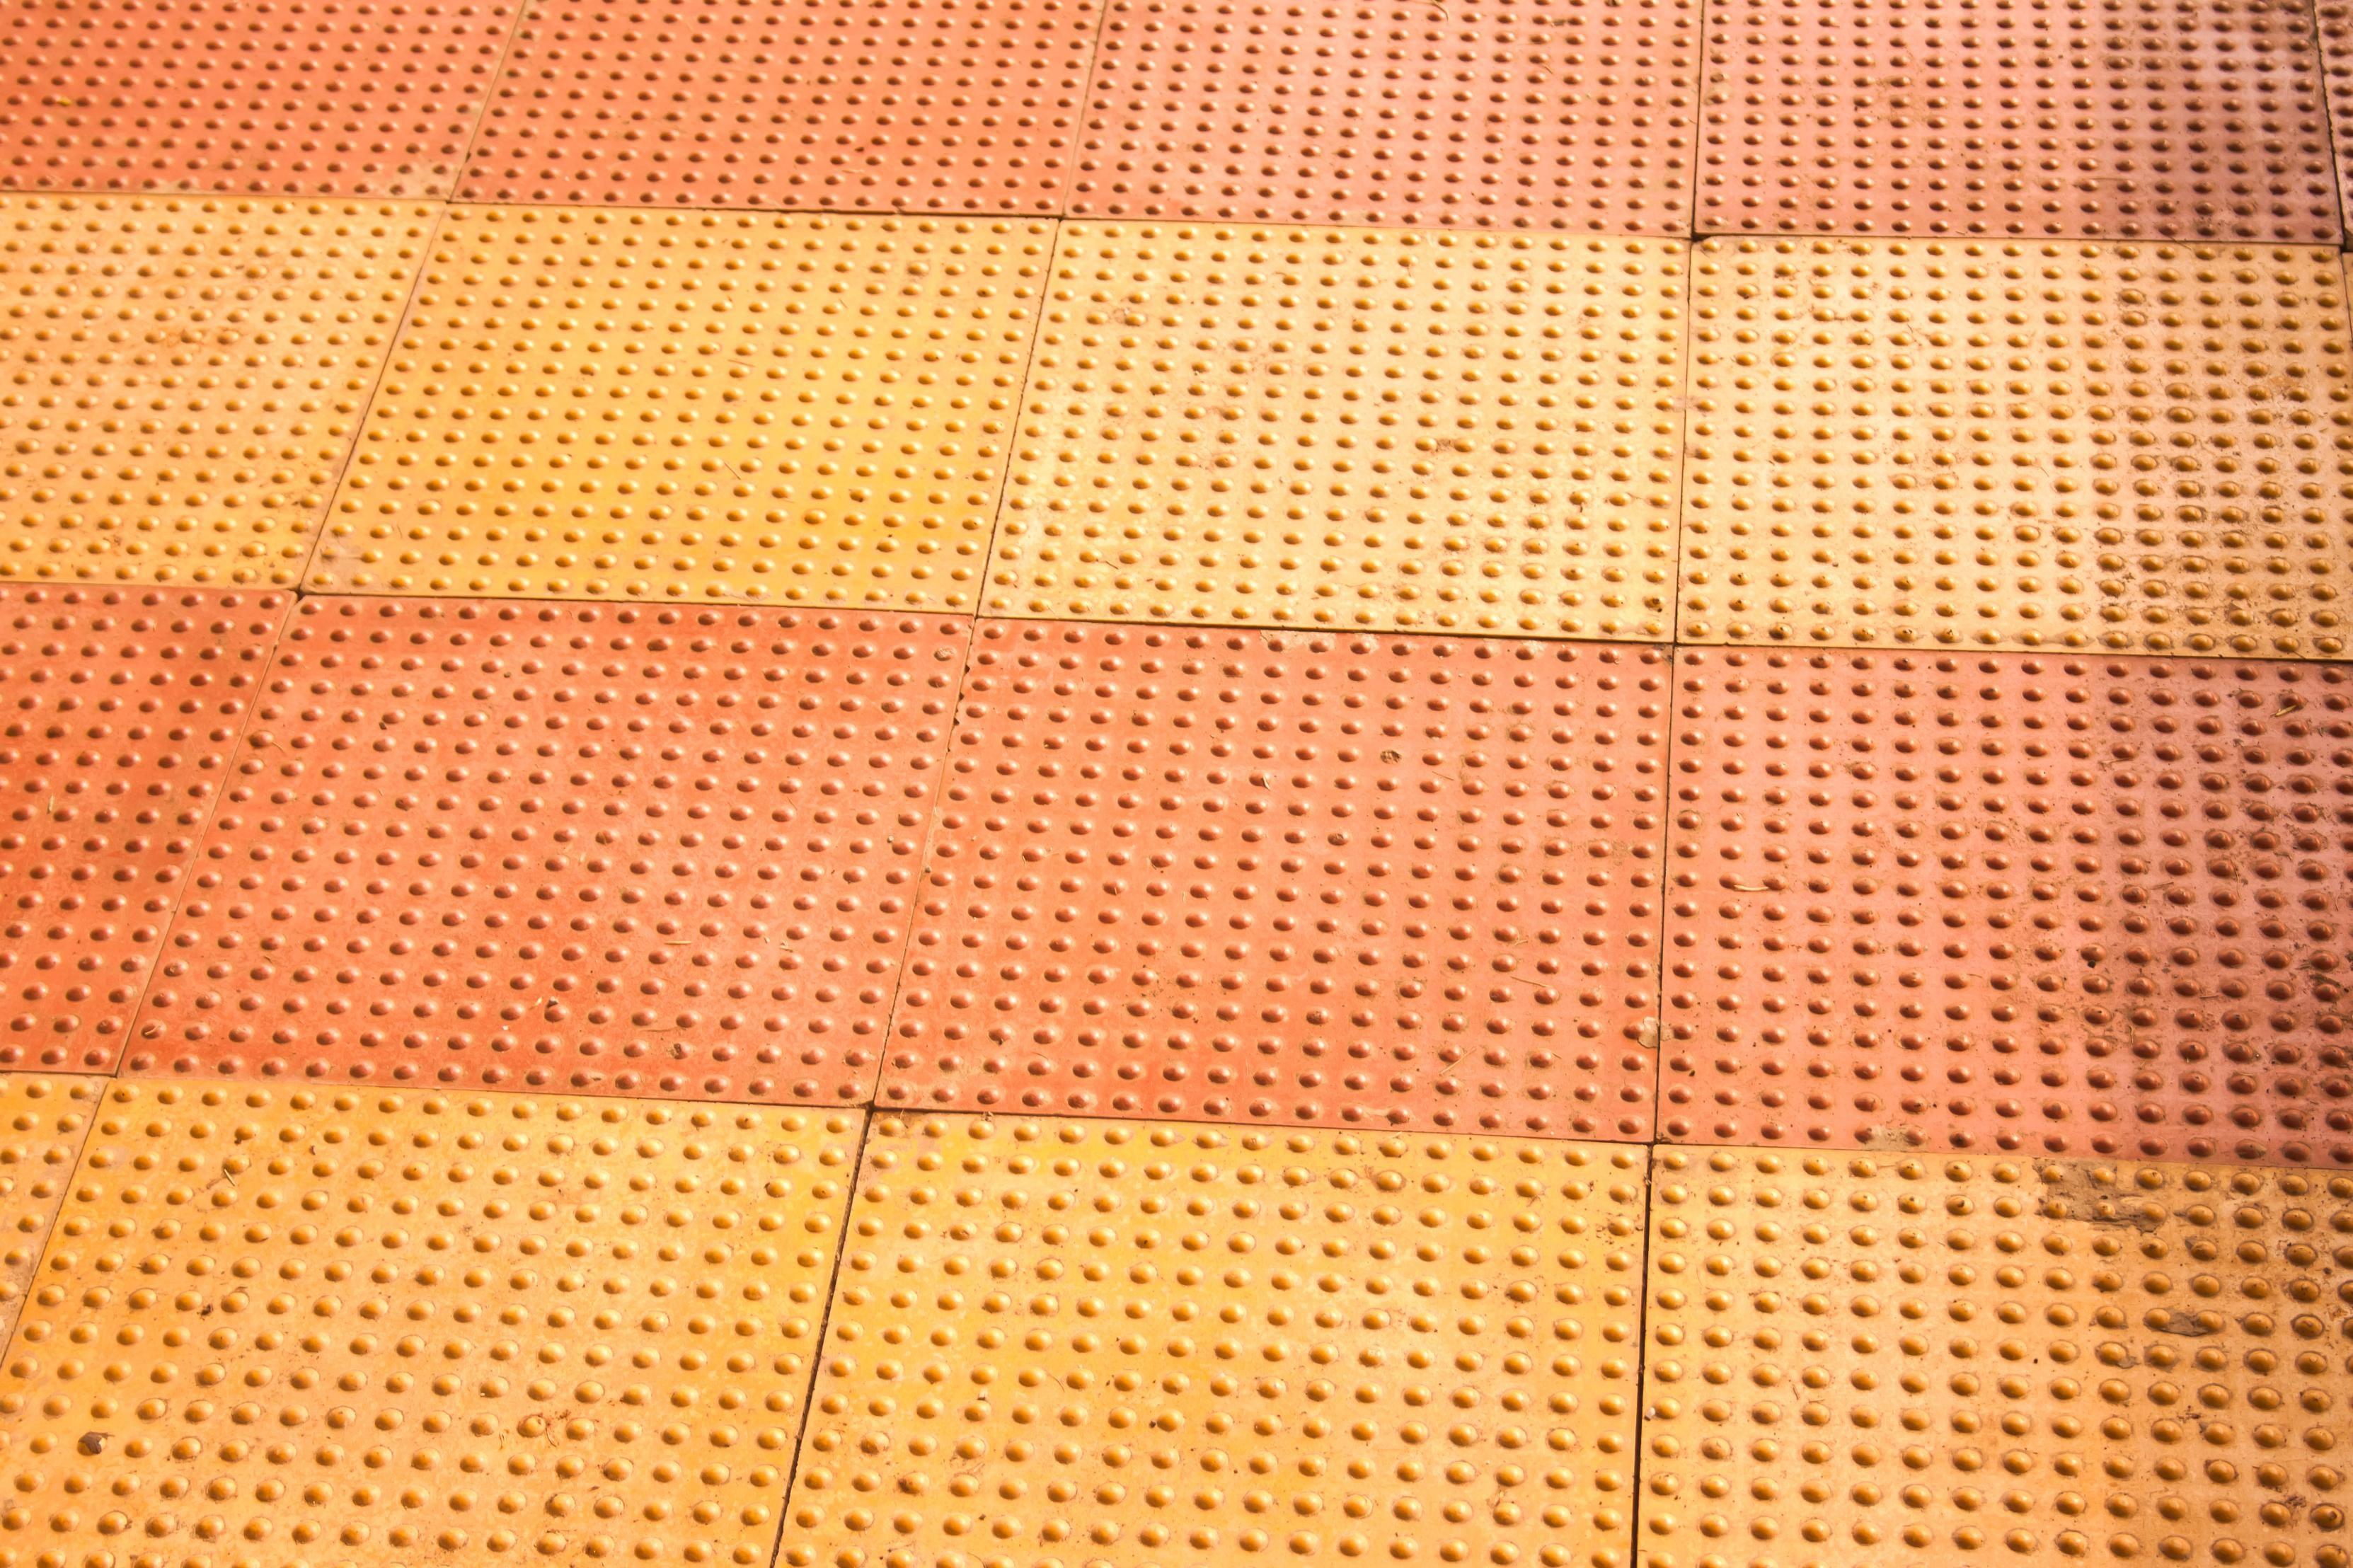 Image libre: Carrelage, plastique, texture, couleur orange, jaune ...